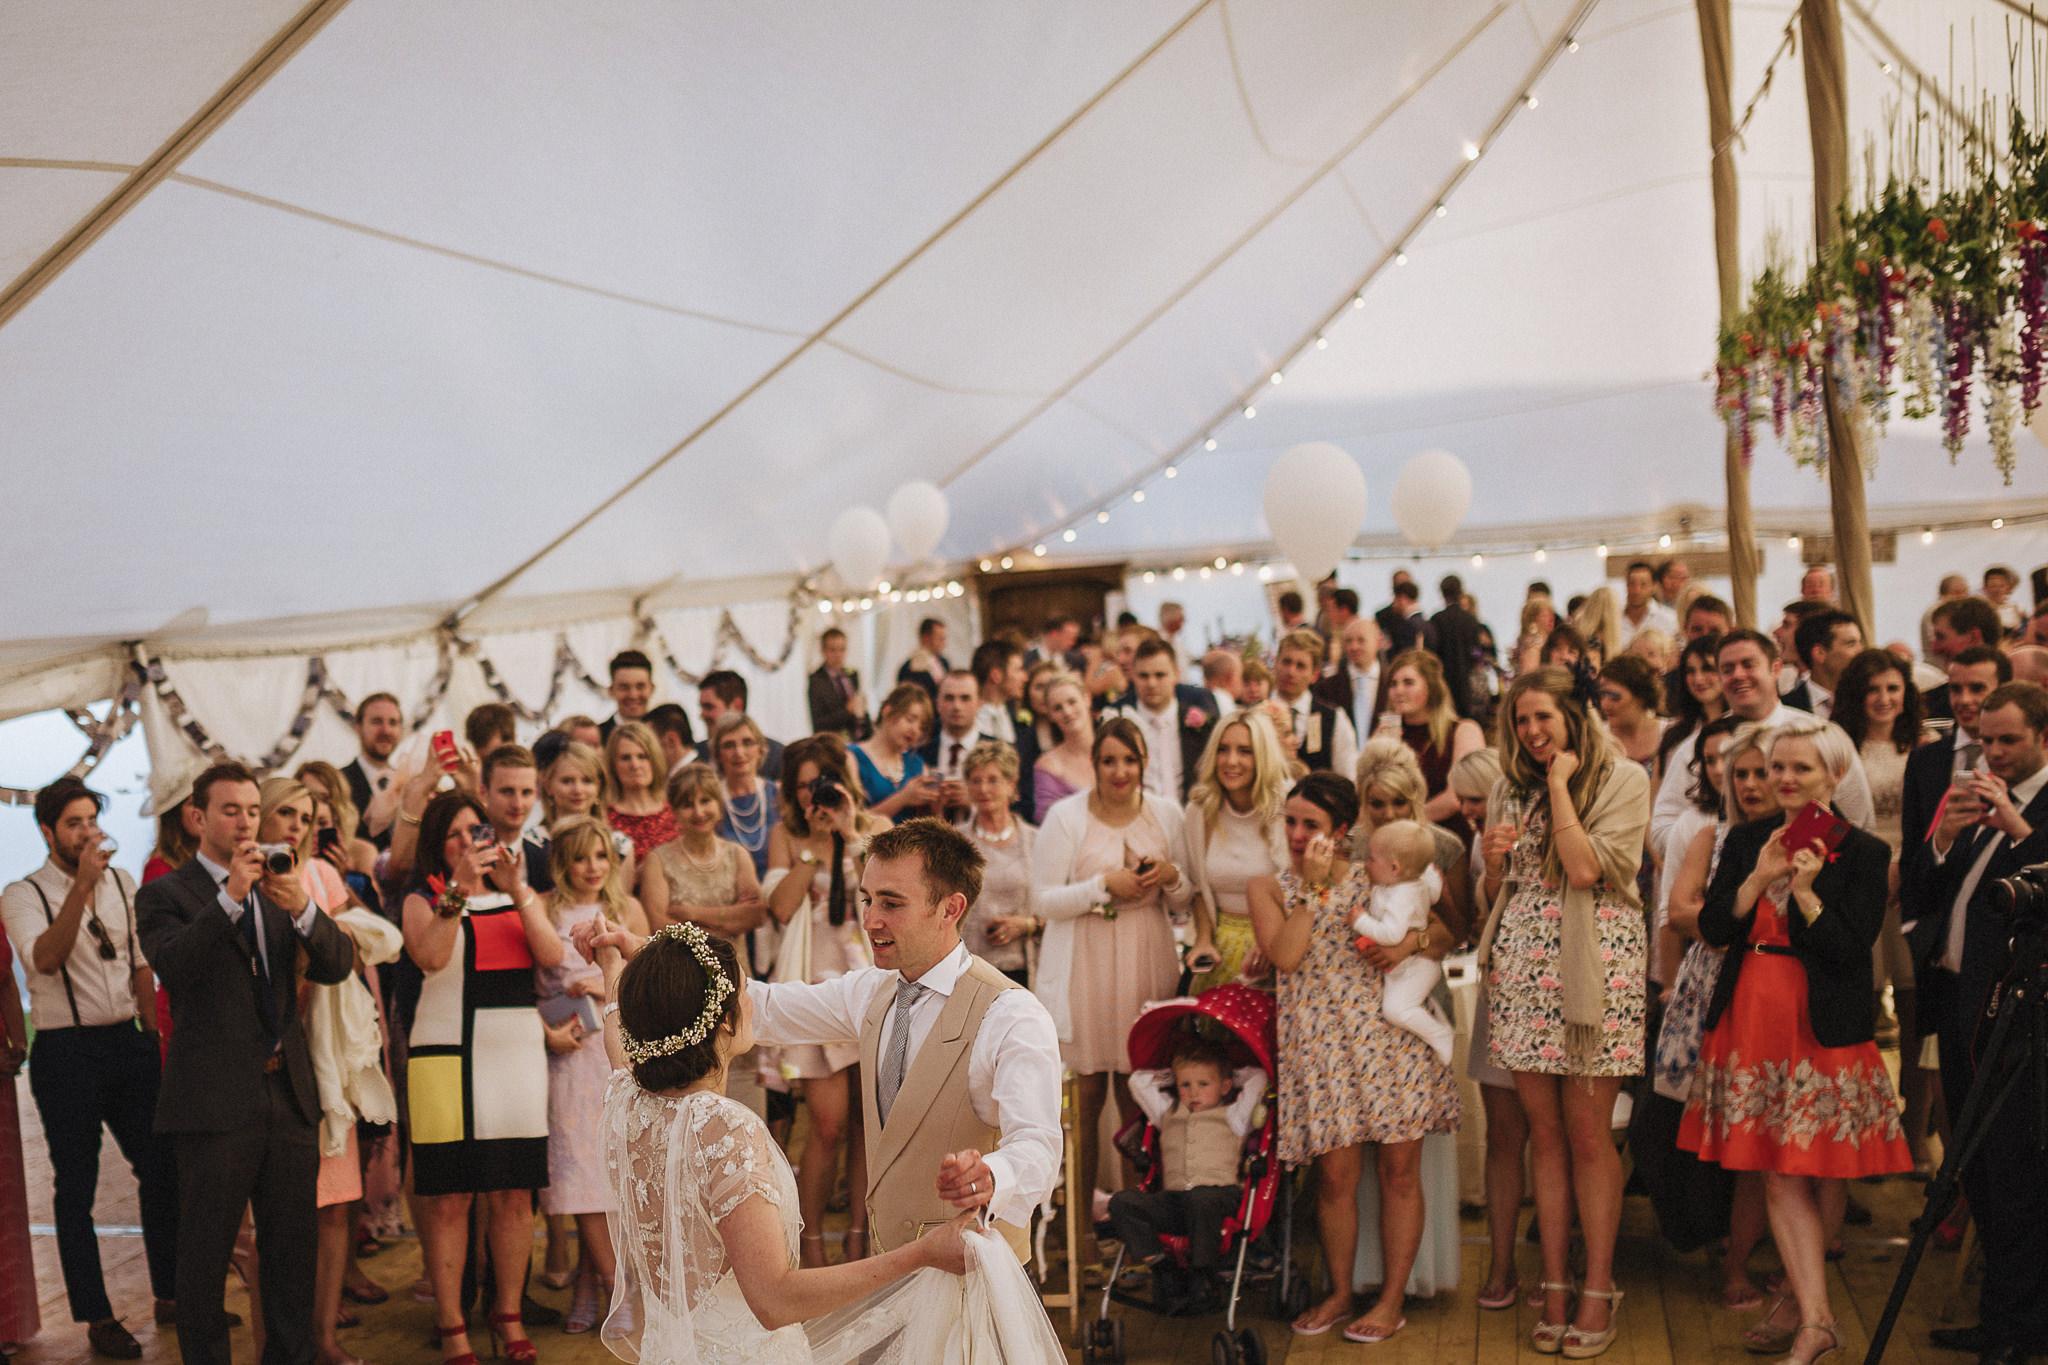 paul-marbrook-Farm-Wedding-Photographer-Lancashire-90088